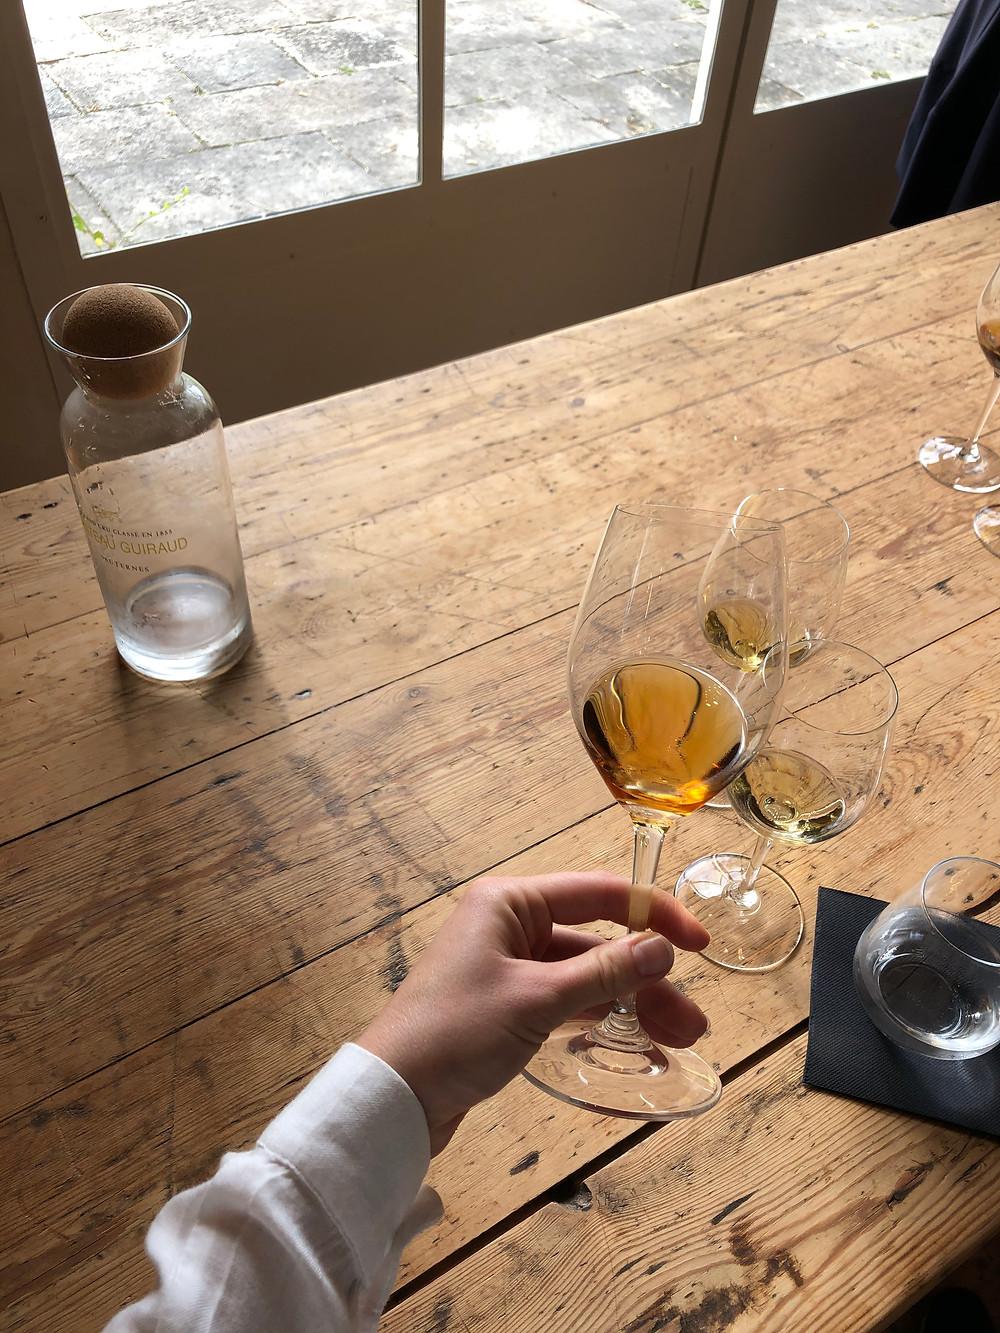 Vertical Sauternes wine tasting at organic winery Chateau Guiraud Premier Grand Cru Classe in Sauternes village